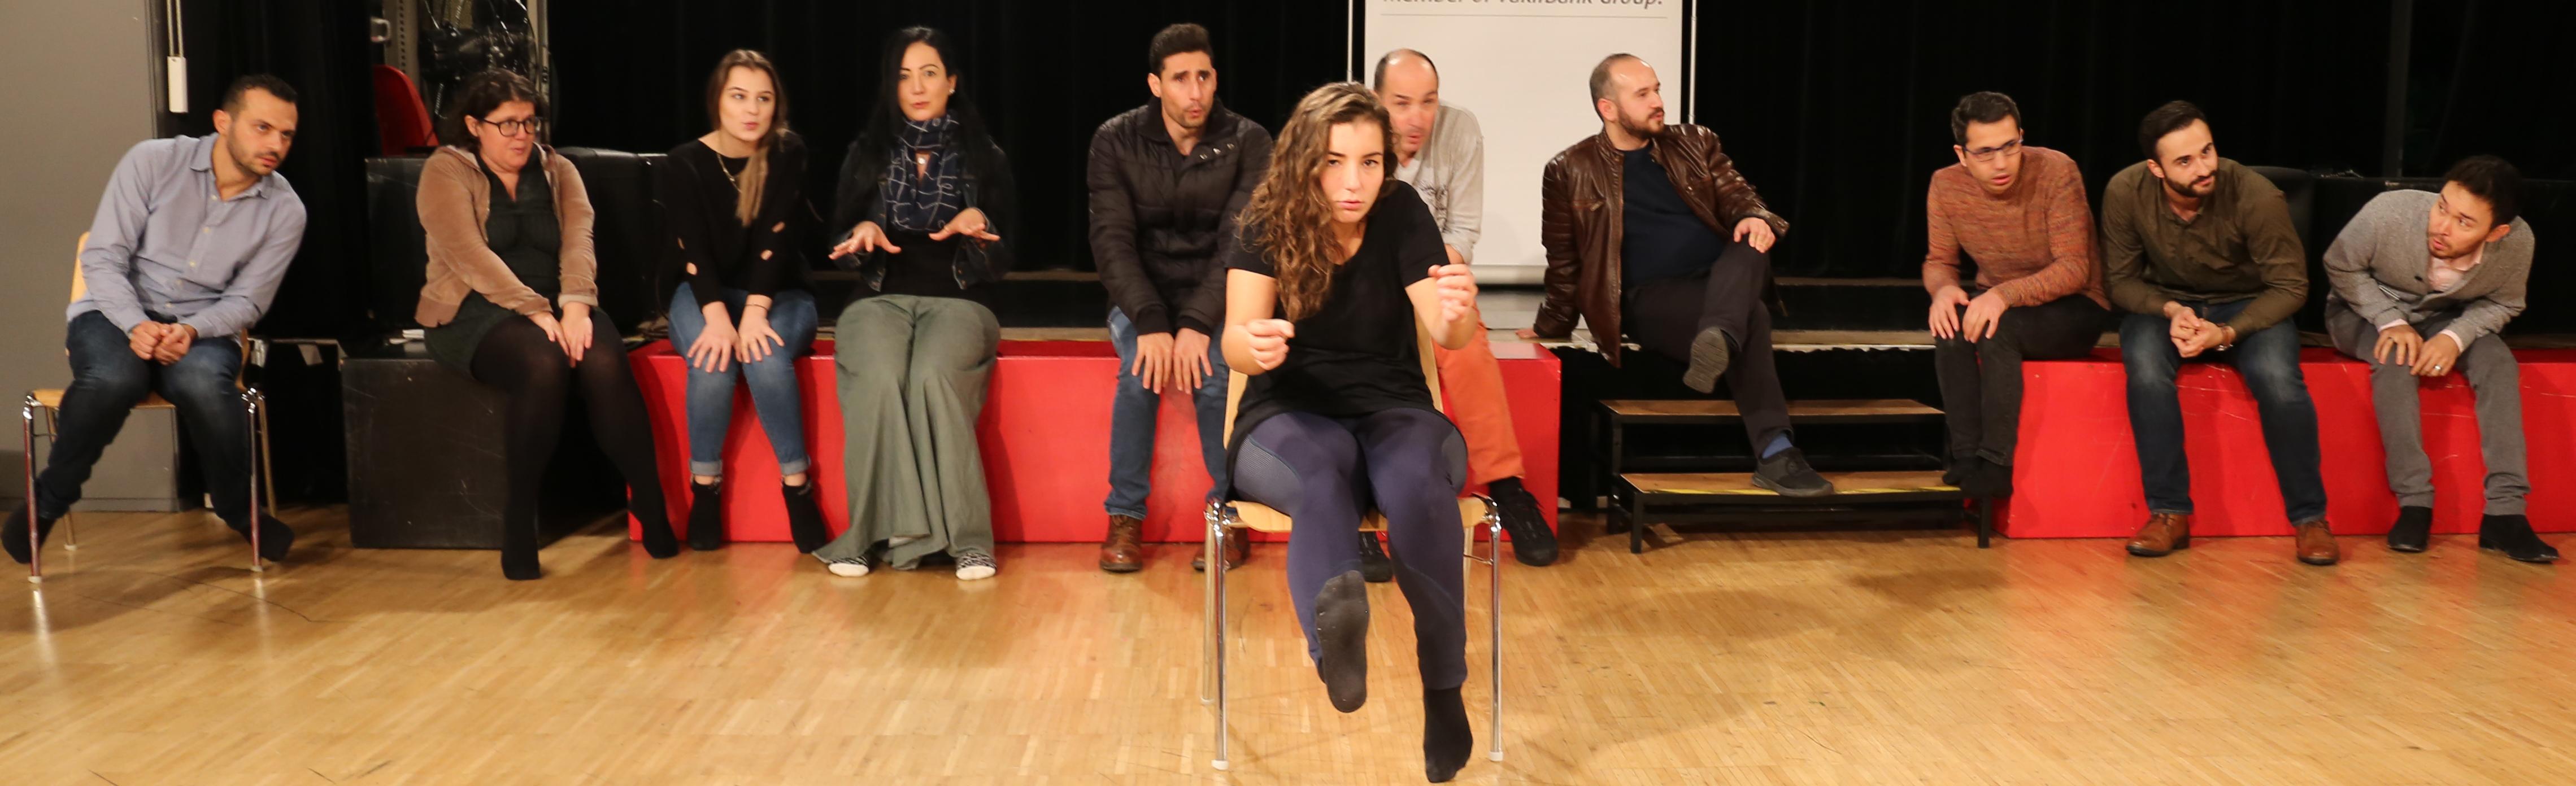 Offene Multilinguale Theaterklasse